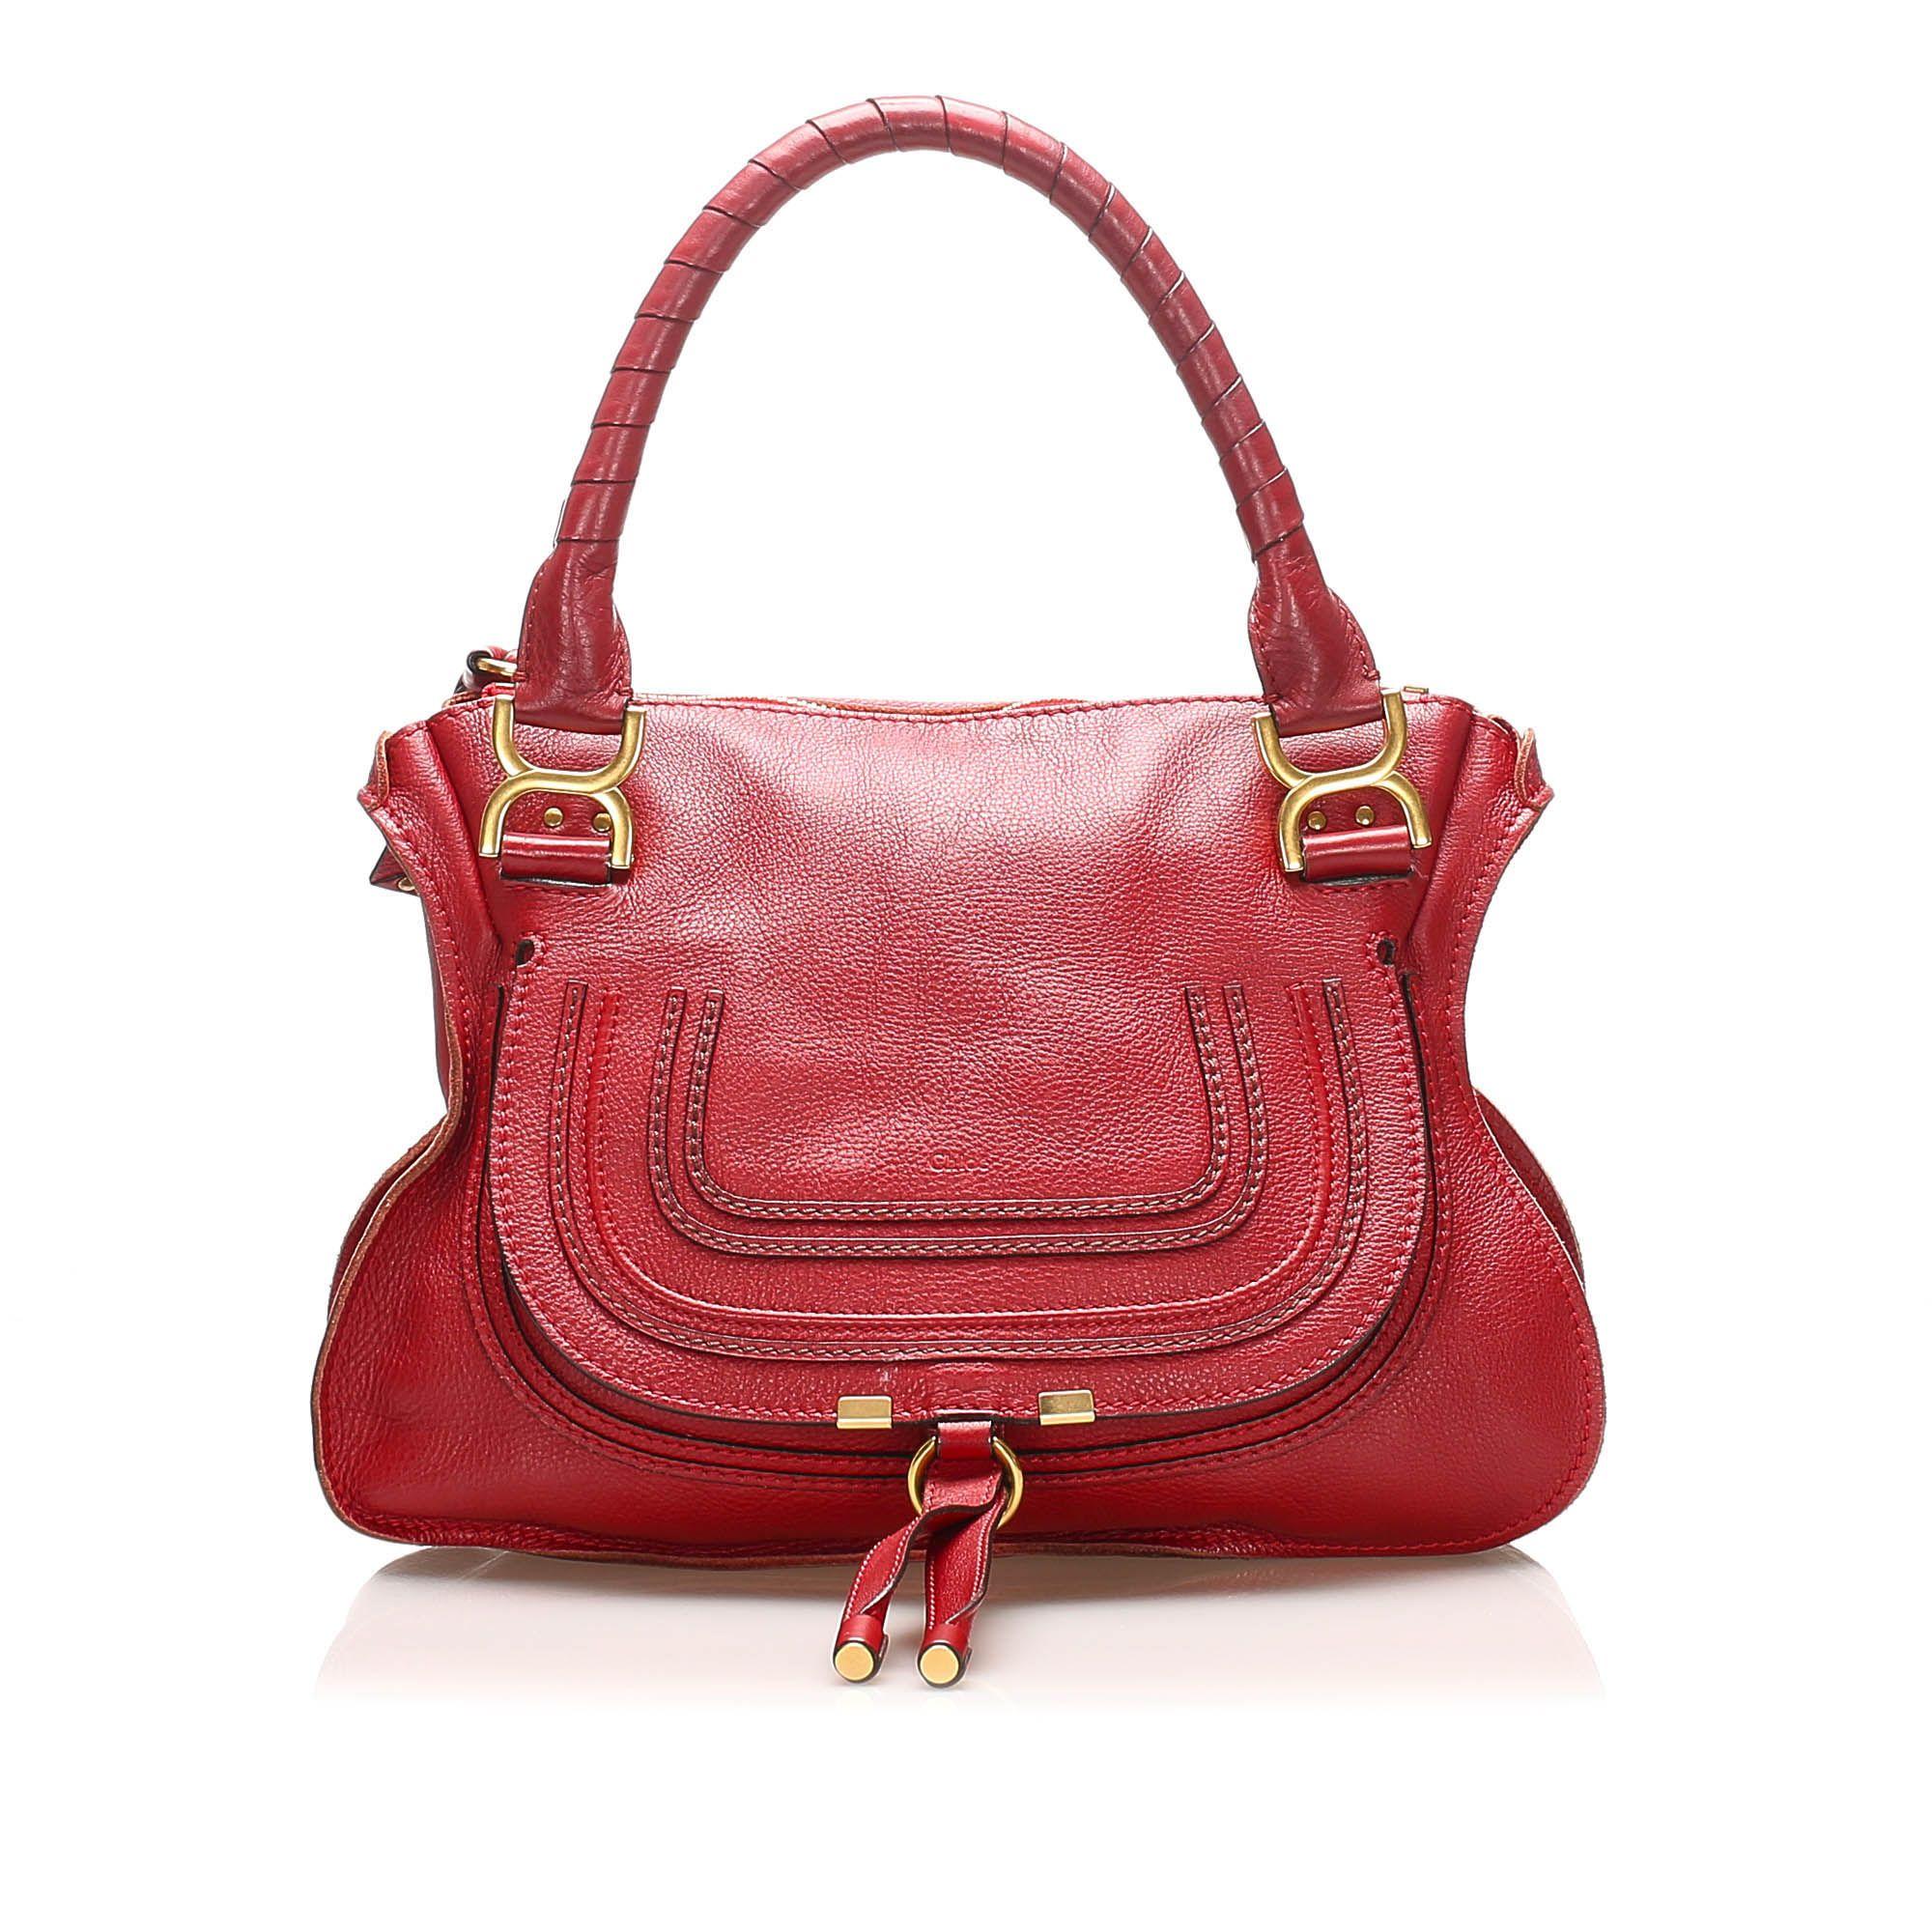 Vintage Chloe Marcie Leather Handbag Red